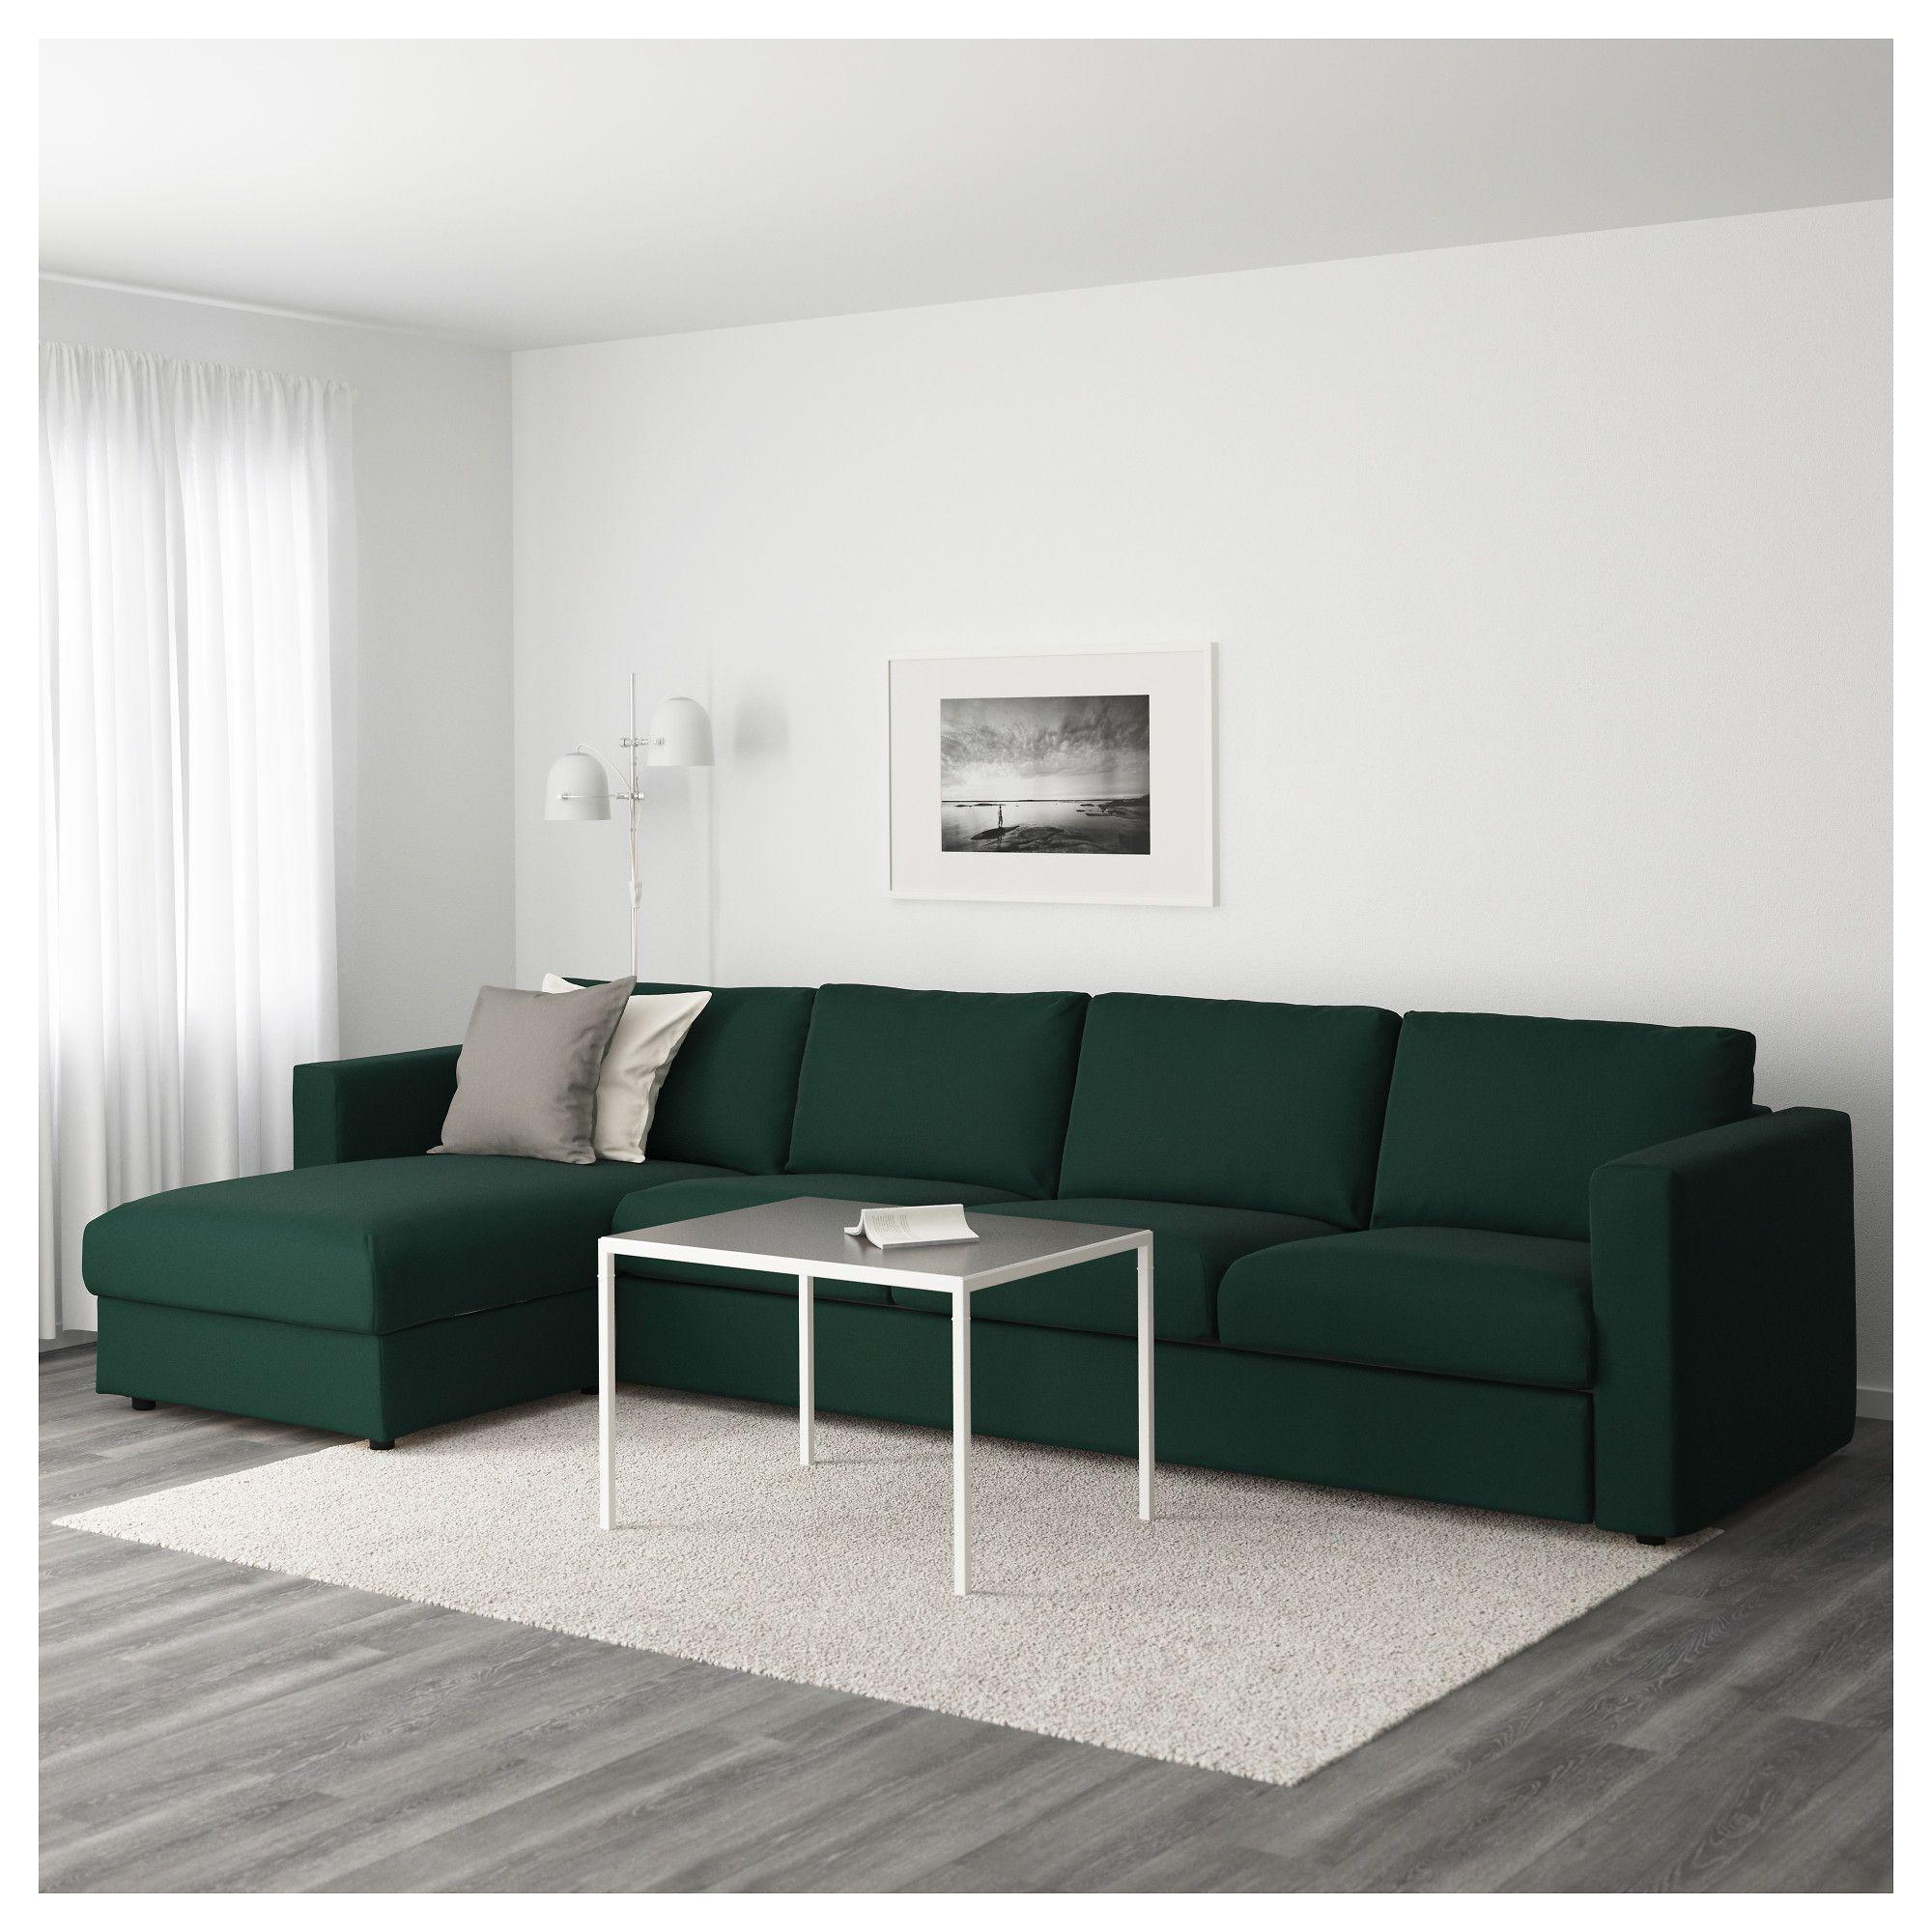 Strange Vimle Sectional 4 Seat With Chaise Gunnared Dark Green Uwap Interior Chair Design Uwaporg